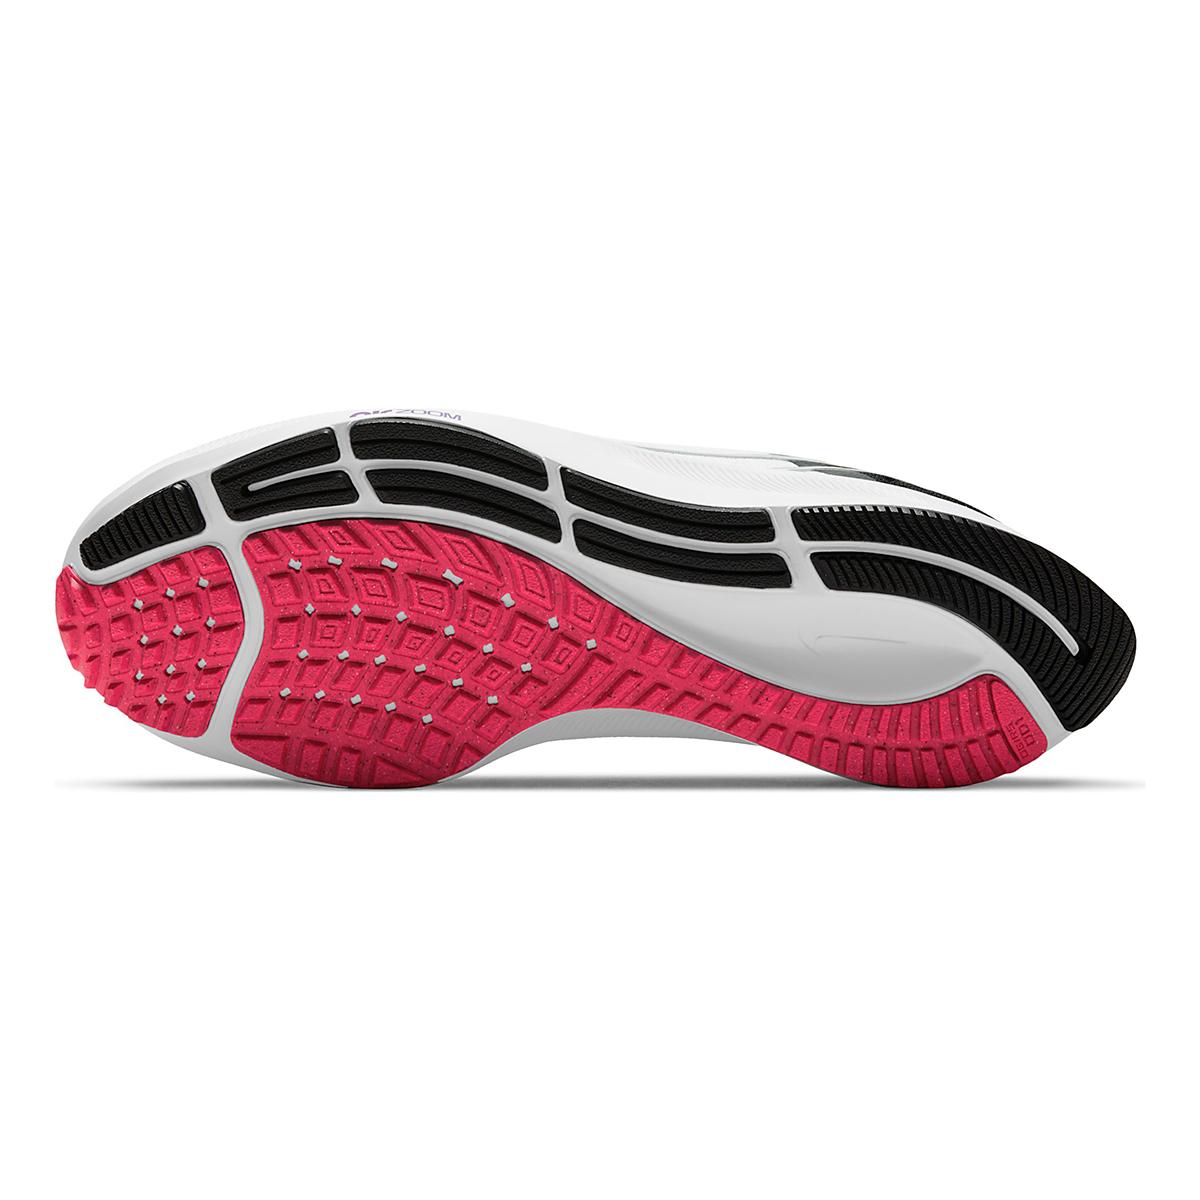 Women's Nike Air Zoom Pegasus 38 Running Shoe - Color: White/Metallic Silver/Black - Size: 5 - Width: Regular, White/Metallic Silver/Black, large, image 7